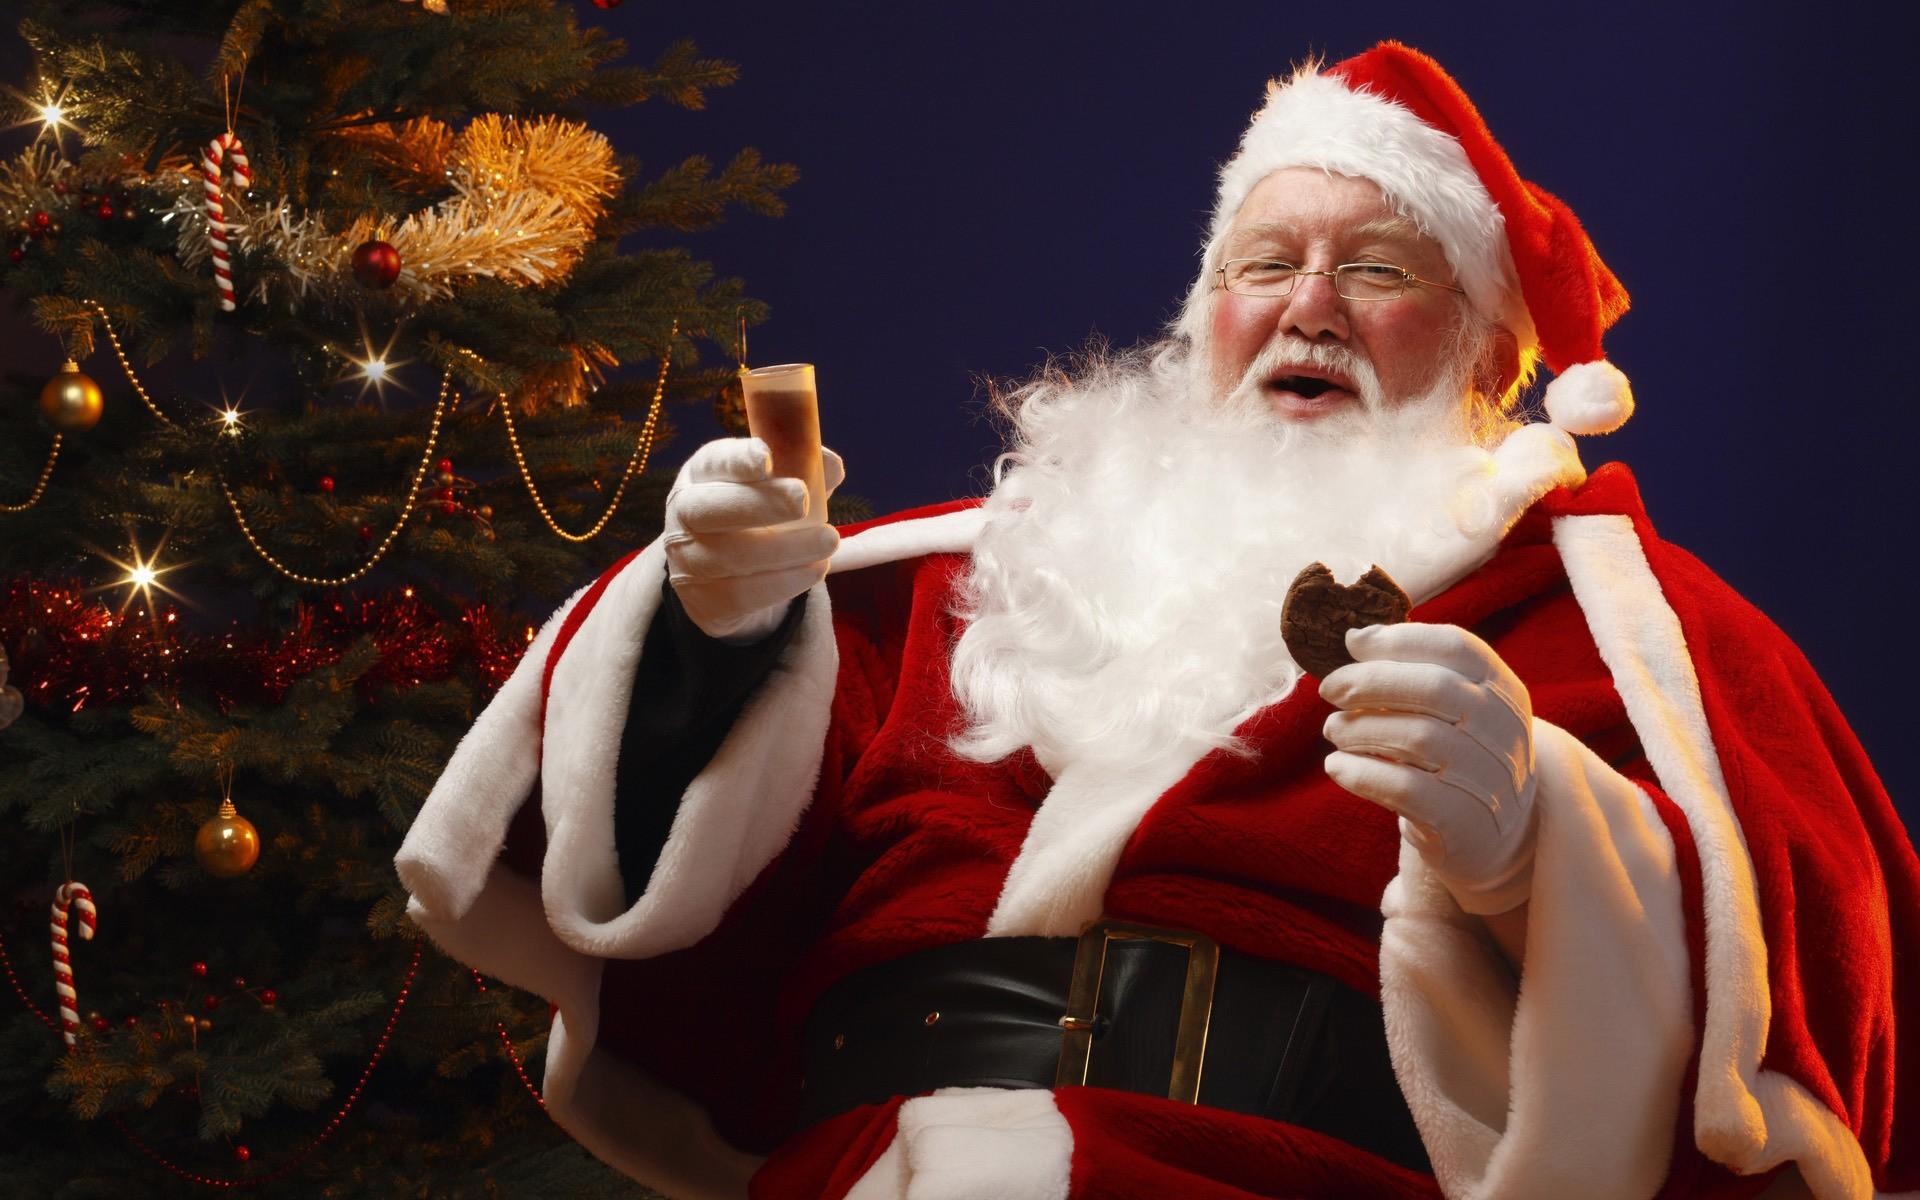 Christmas wallpapers christmas santa claus 043055 jpg